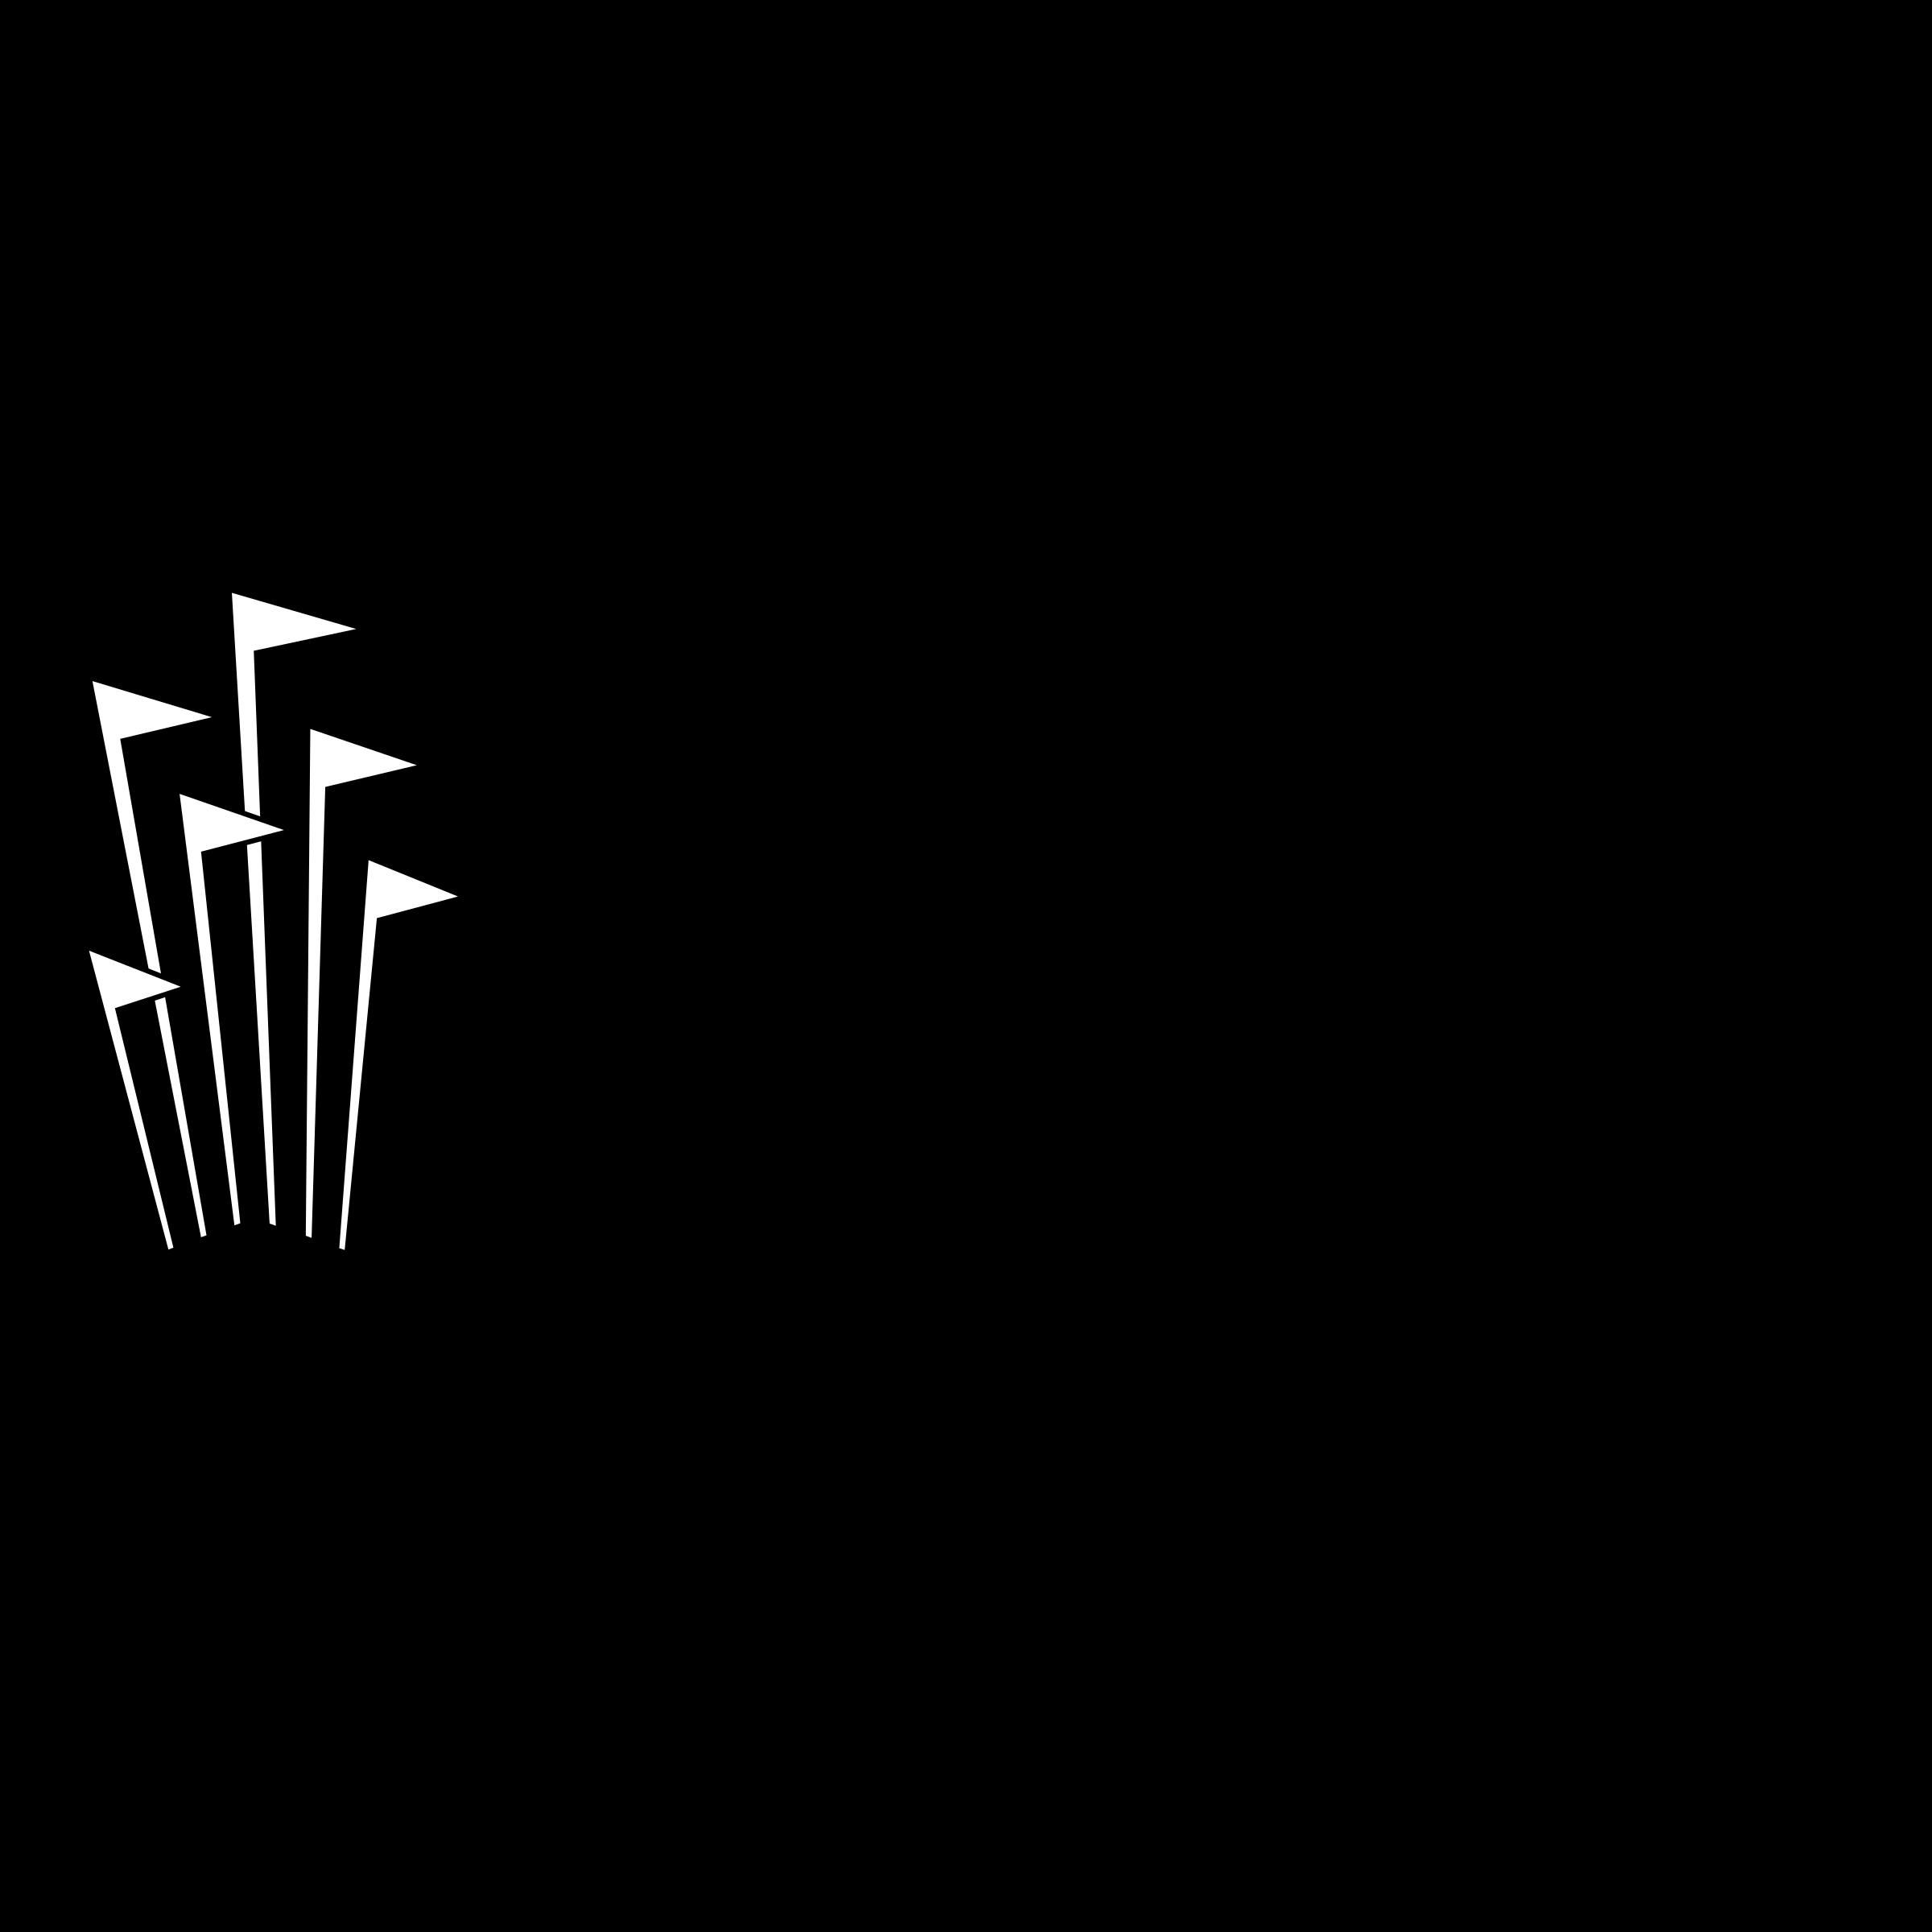 six-flags-1-logo-png-transparent.png